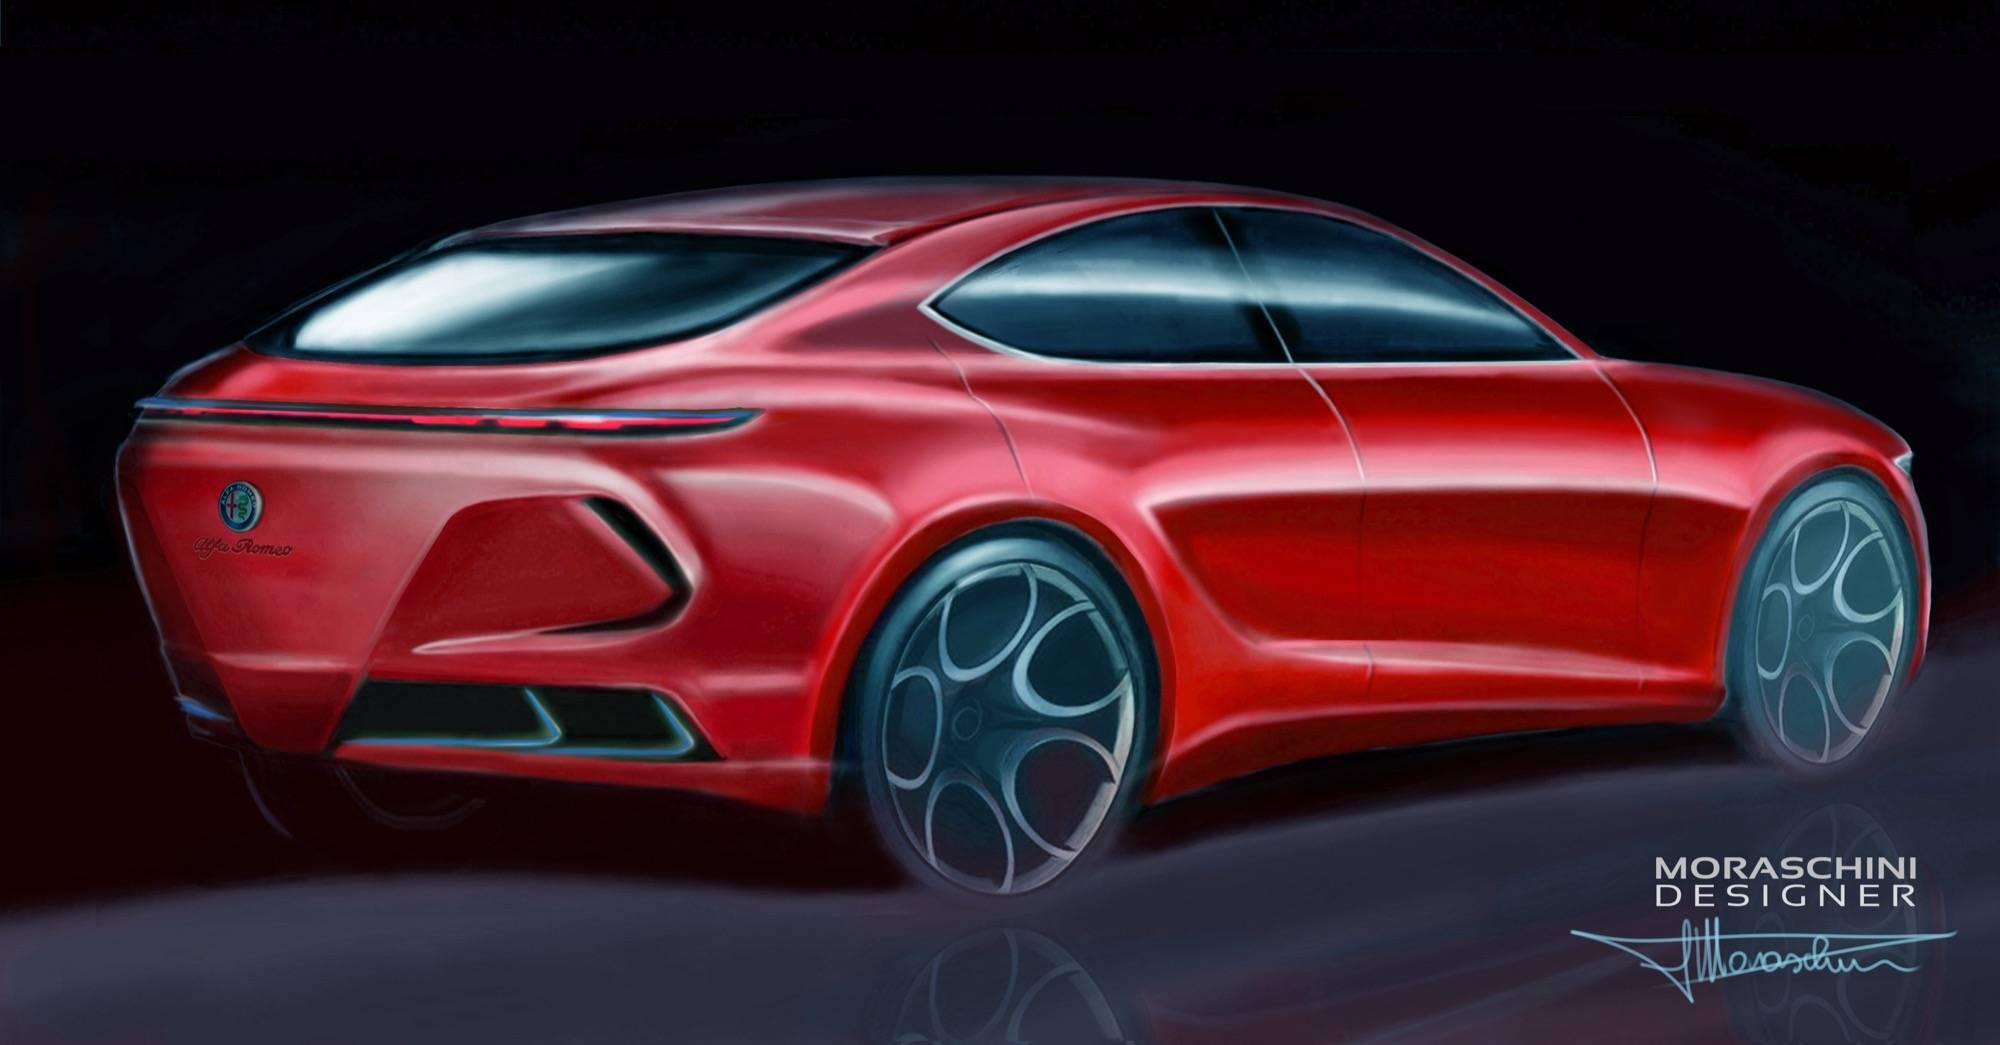 Alfa-Romeo-Giulietta-elettrica-di-Stefano-Moraschini-1.jpg